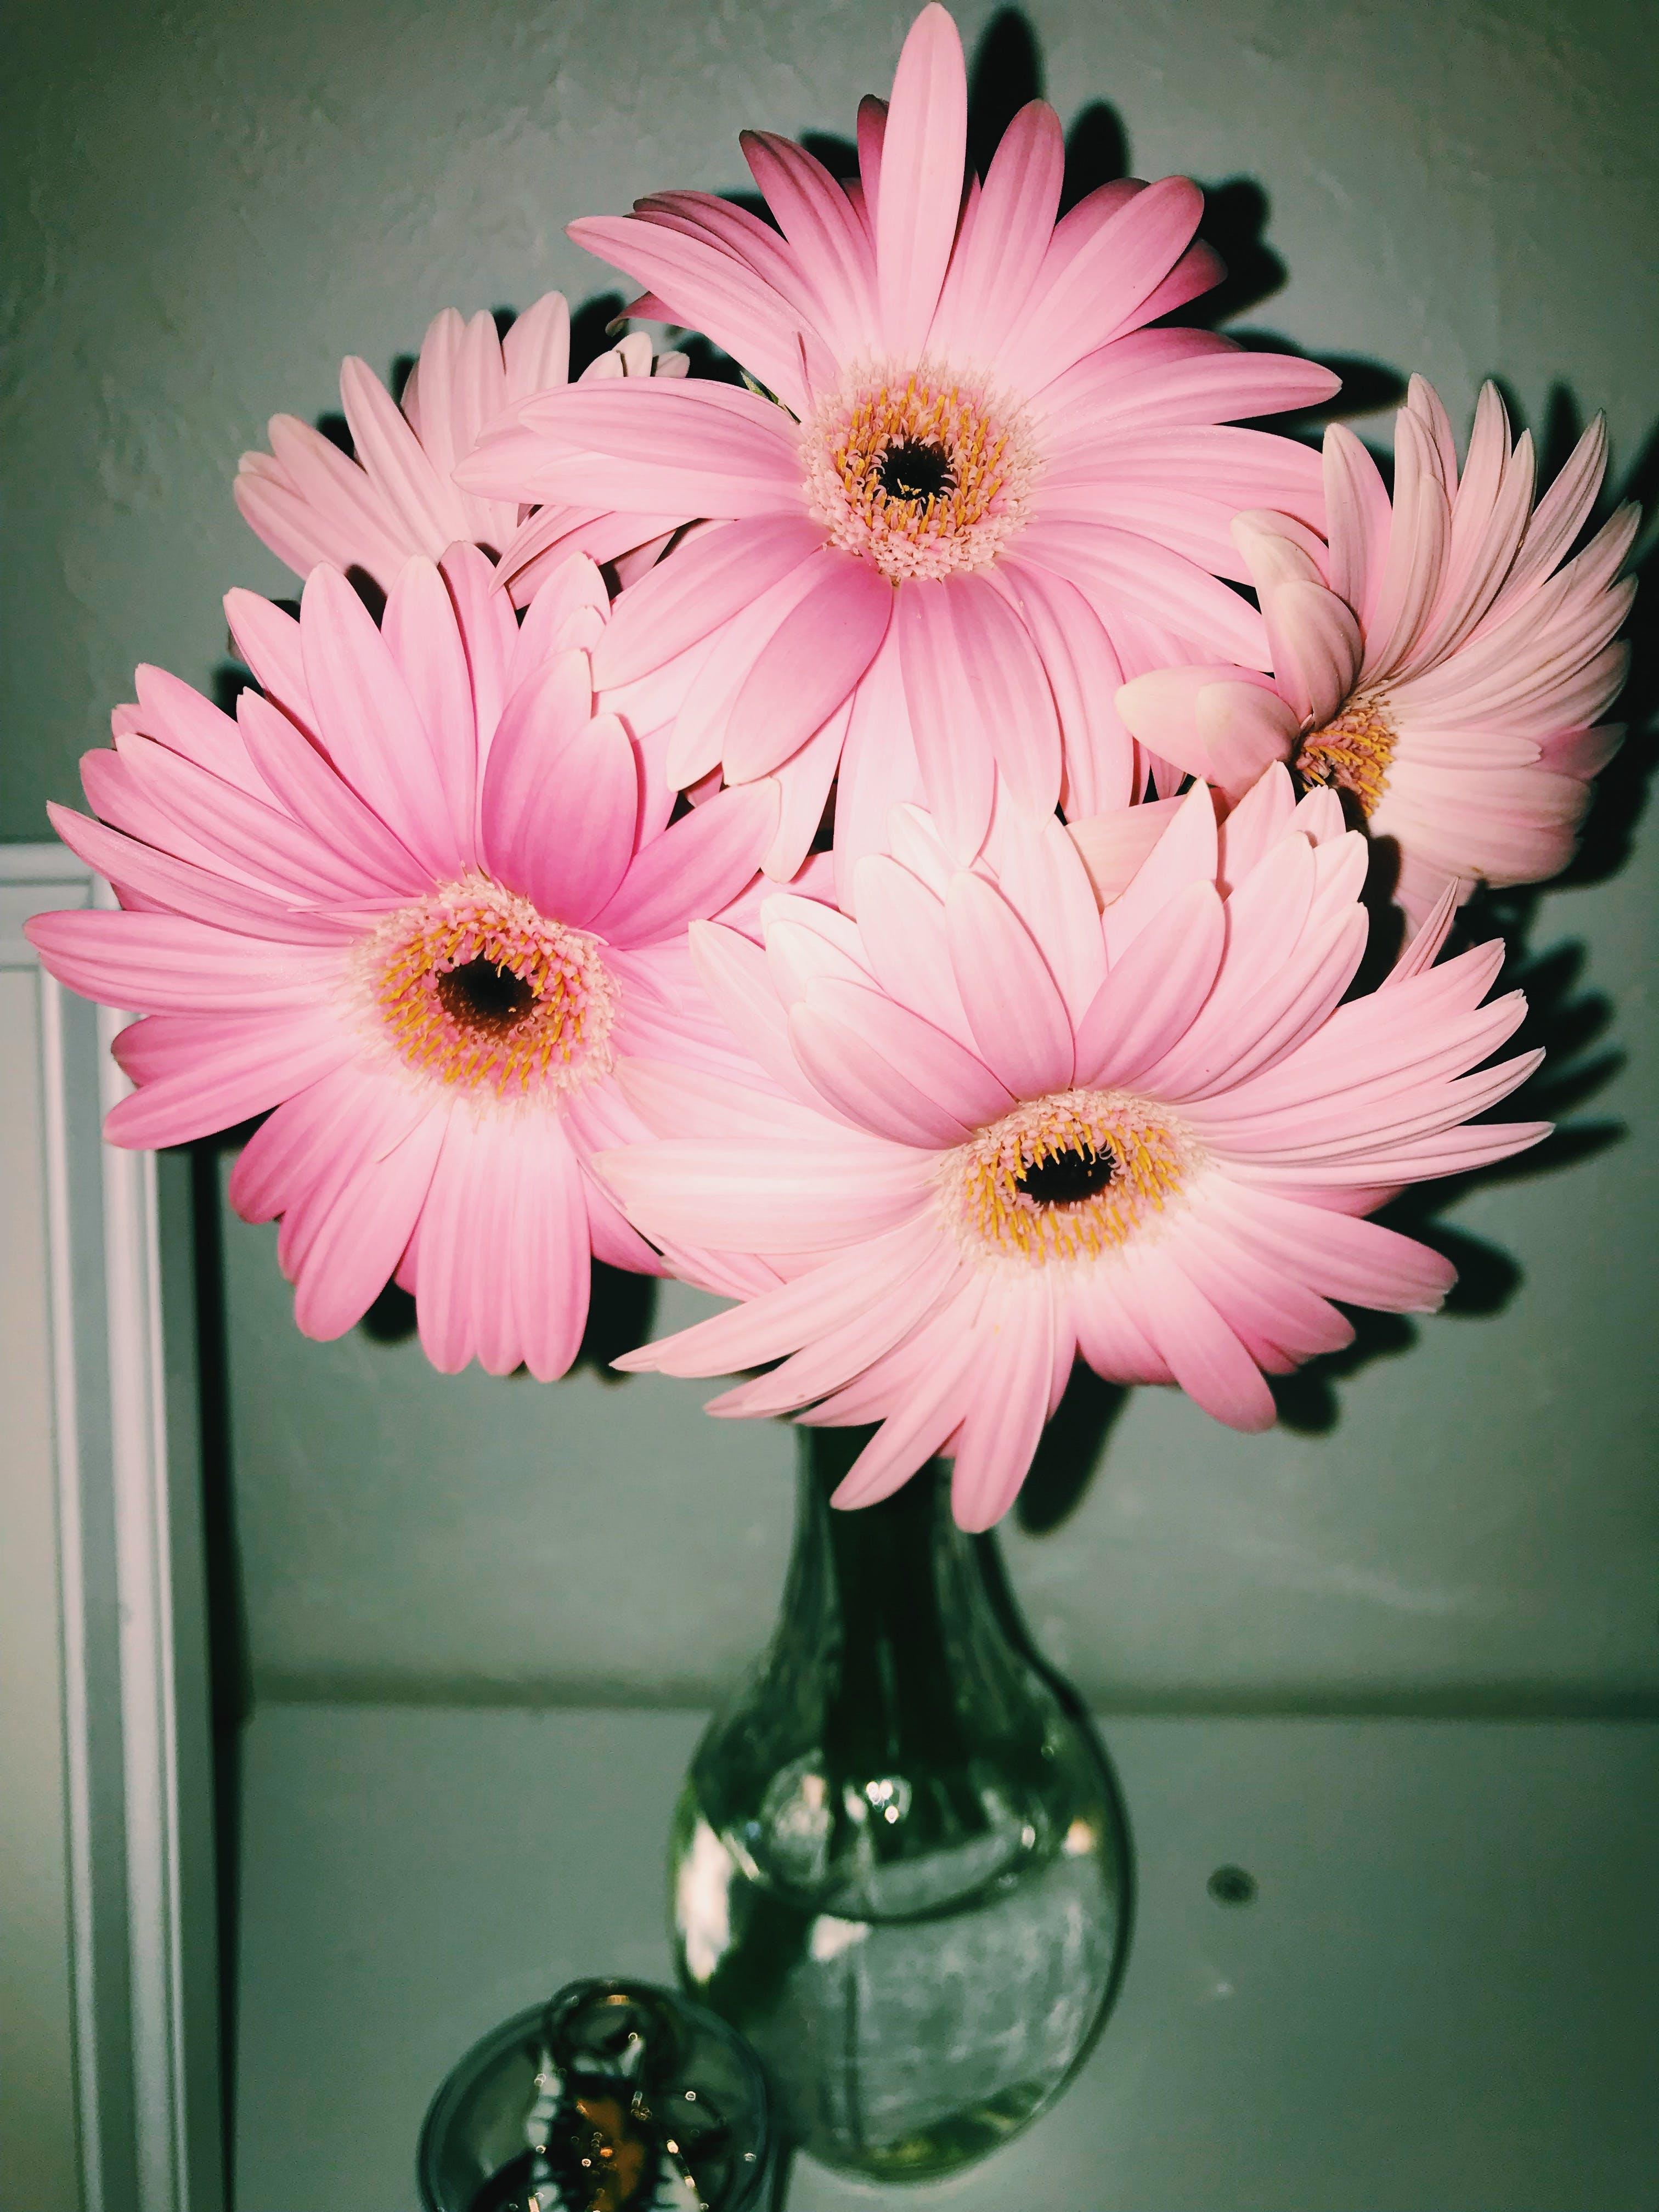 Free stock photo of #flower